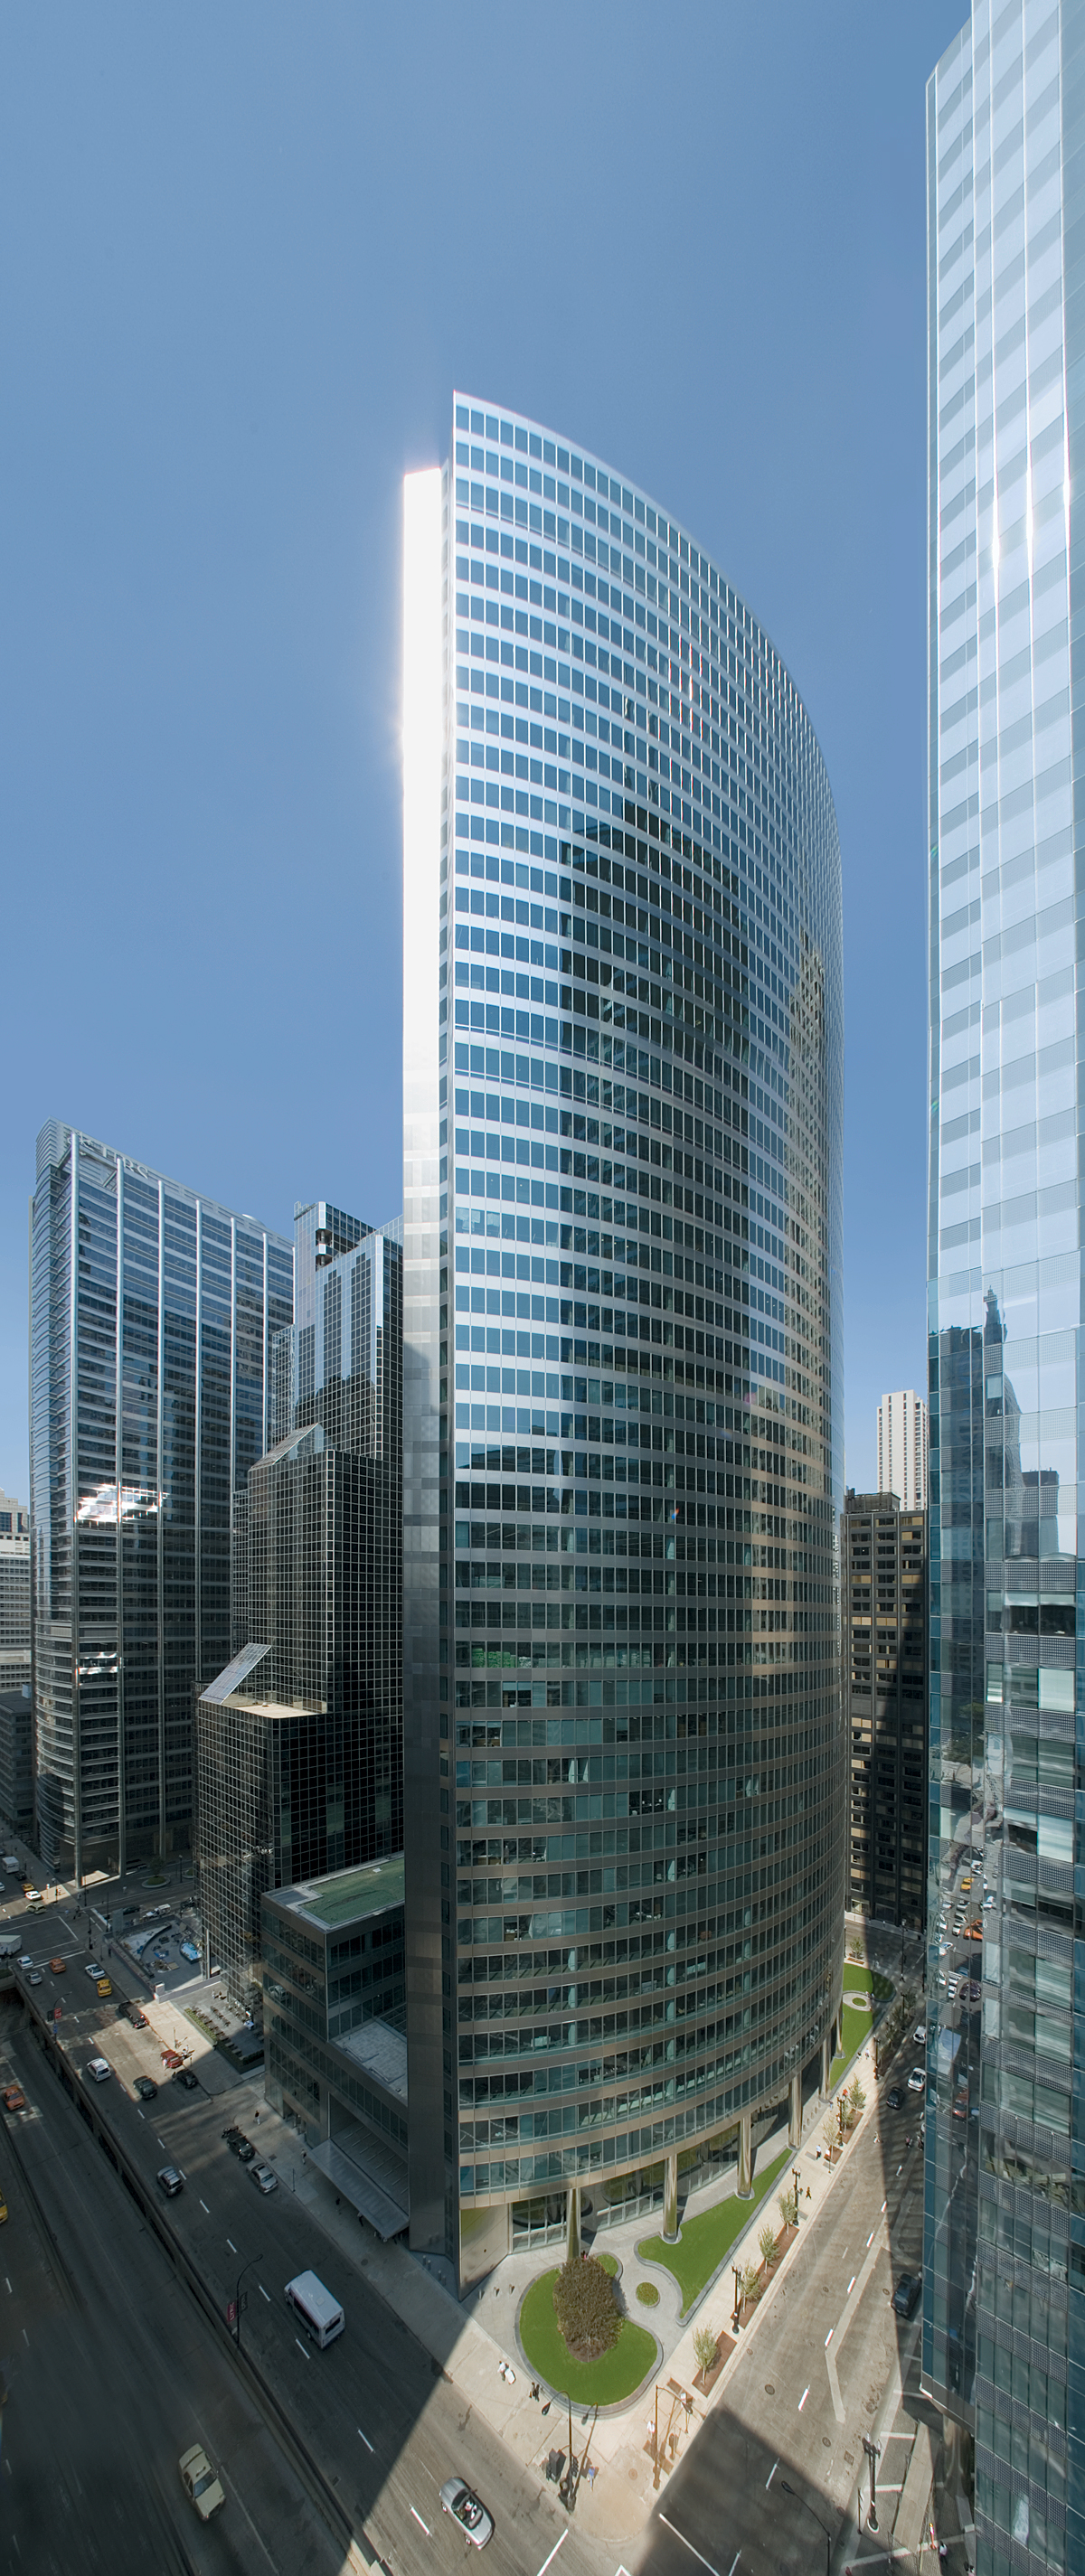 hyatt center - a new chicago skyscraper